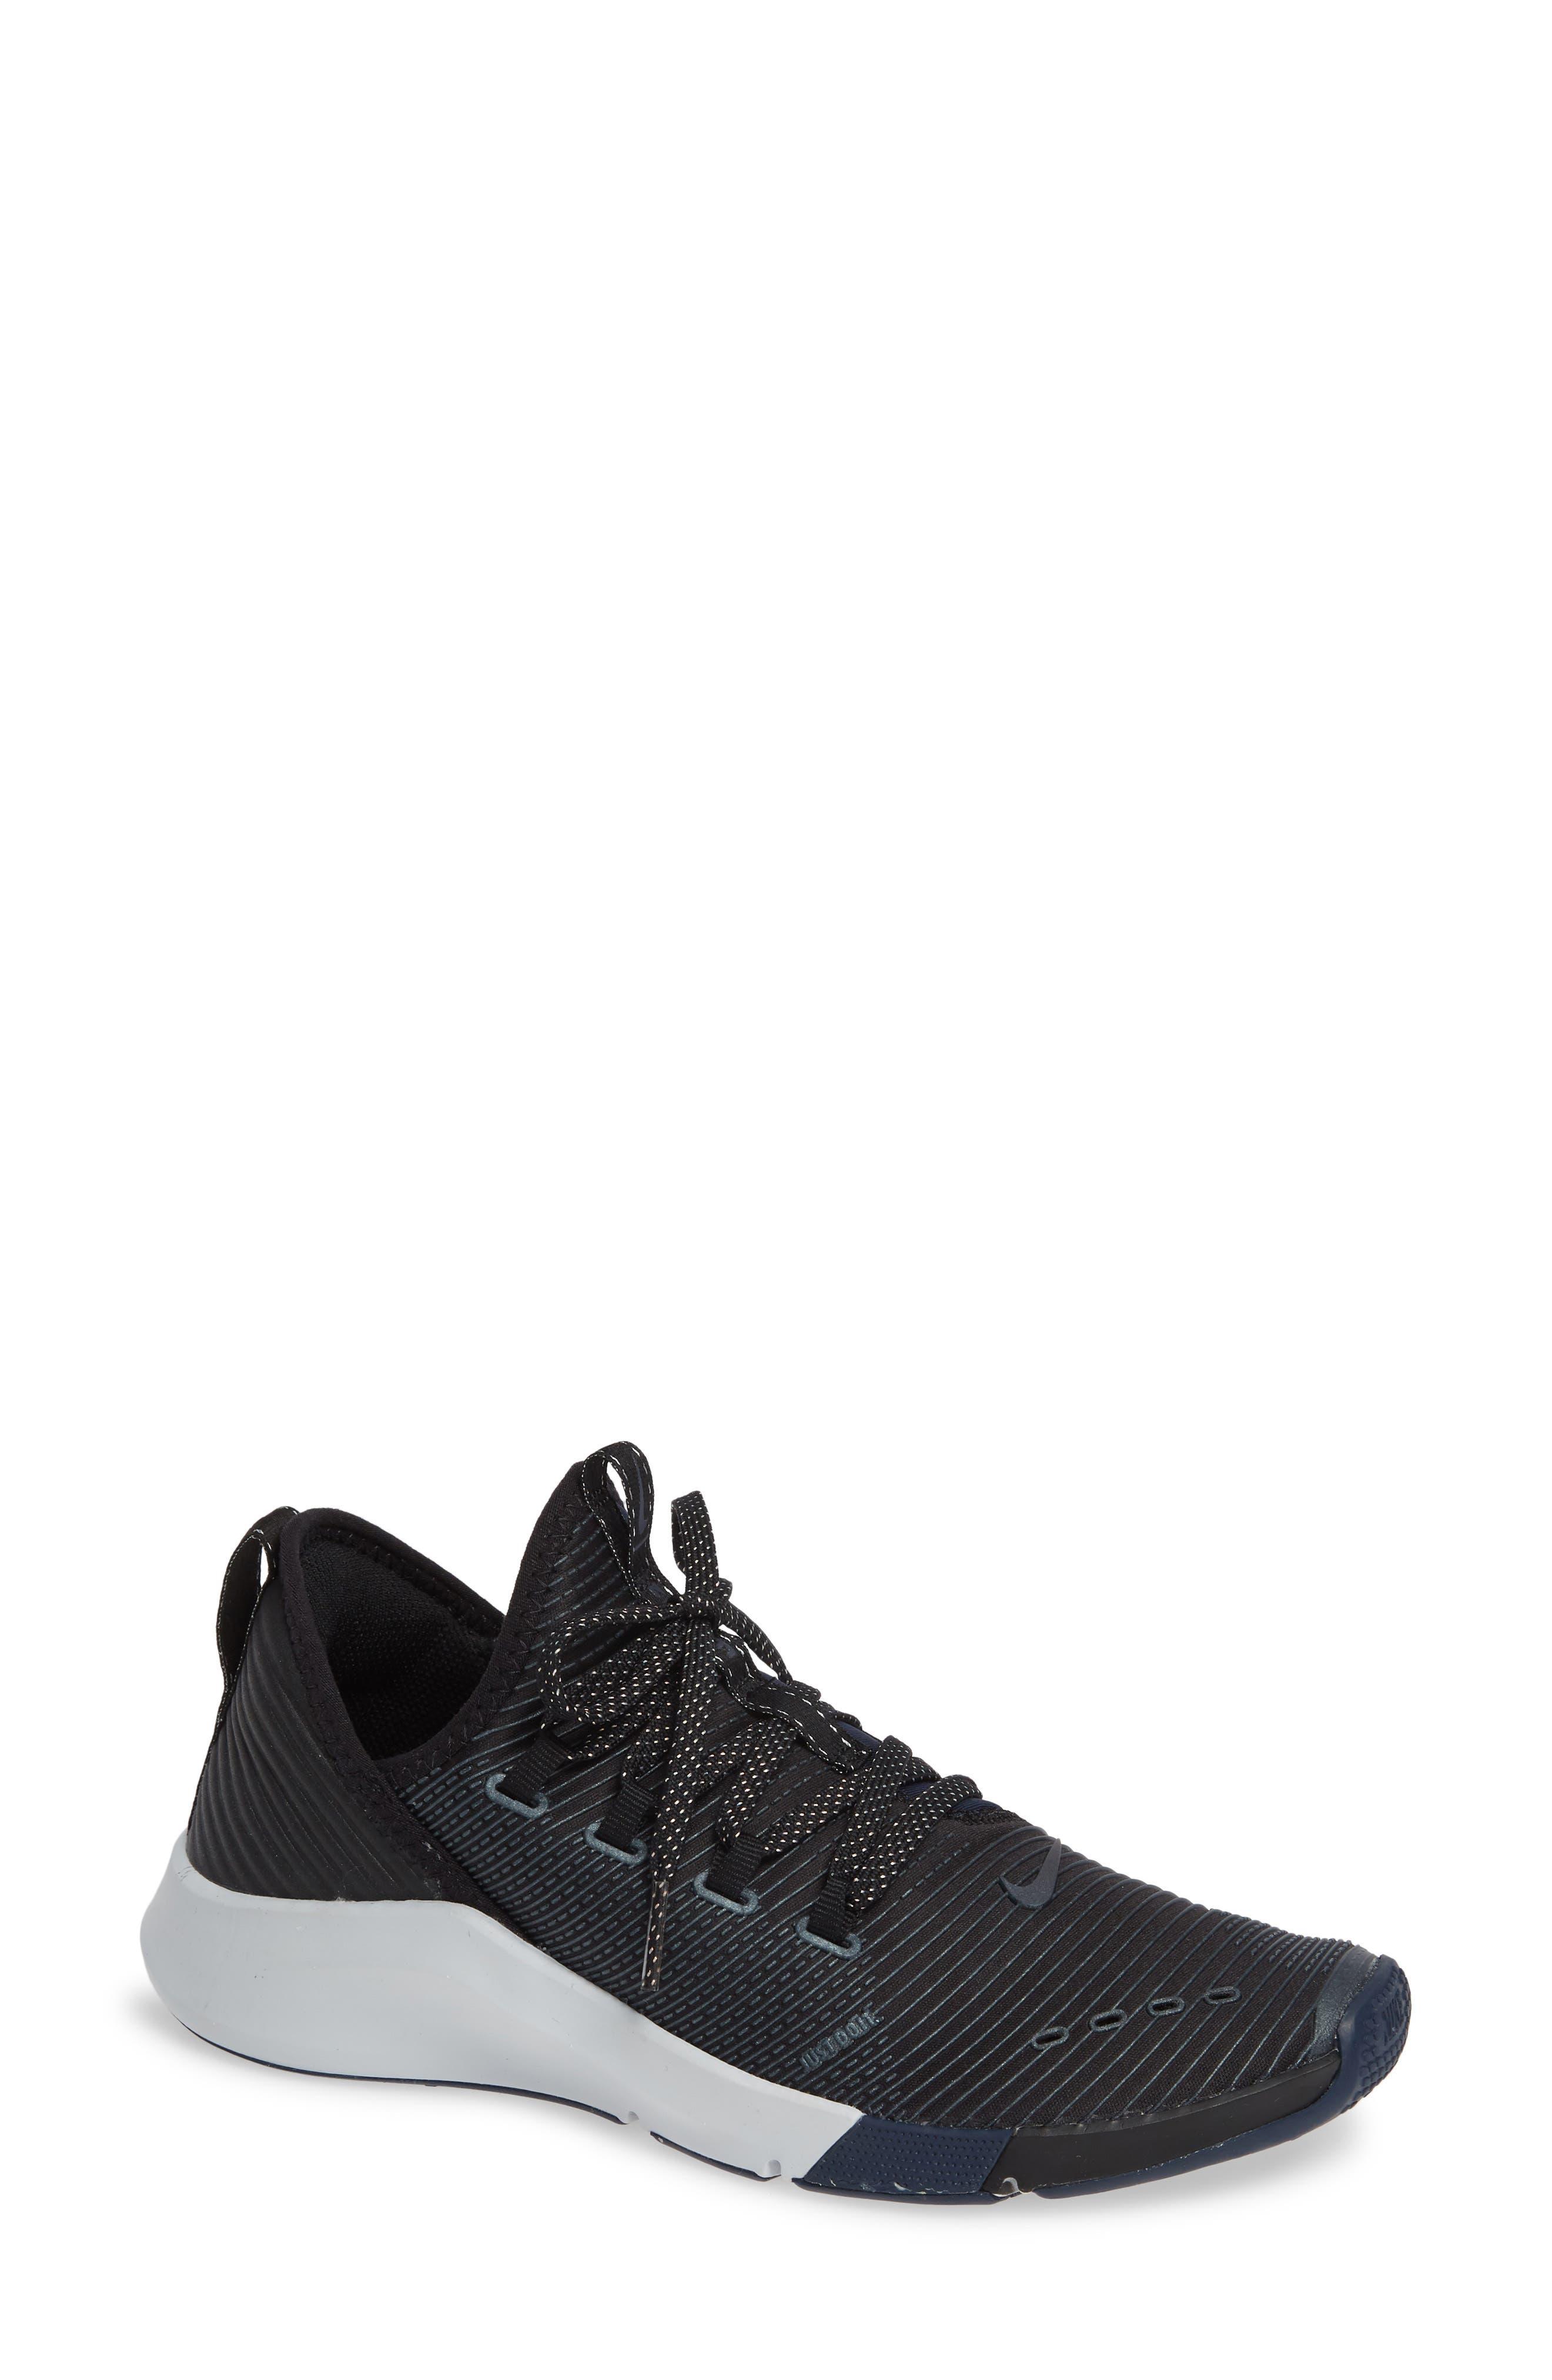 NIKE Air Zoom Elevate Training Shoe, Main, color, BLACK/ METALLIC NAVY- NAVY